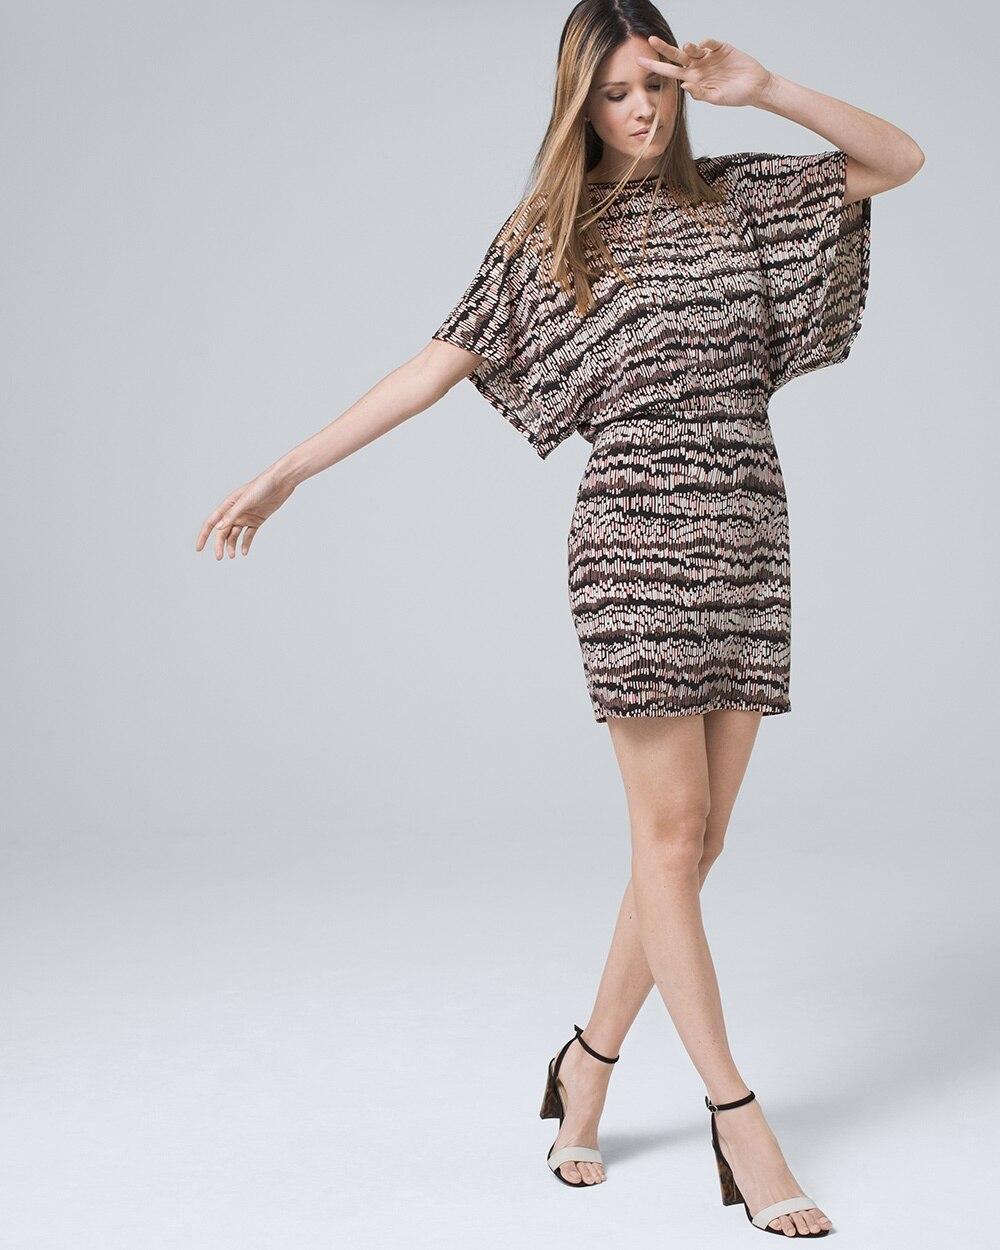 1c3b41d458 WHBM. Kimono-Sleeve Blouson Dress.  98.00  75.00 (23% OFF). BUY AT WHITE  HOUSE BLACK MARKET